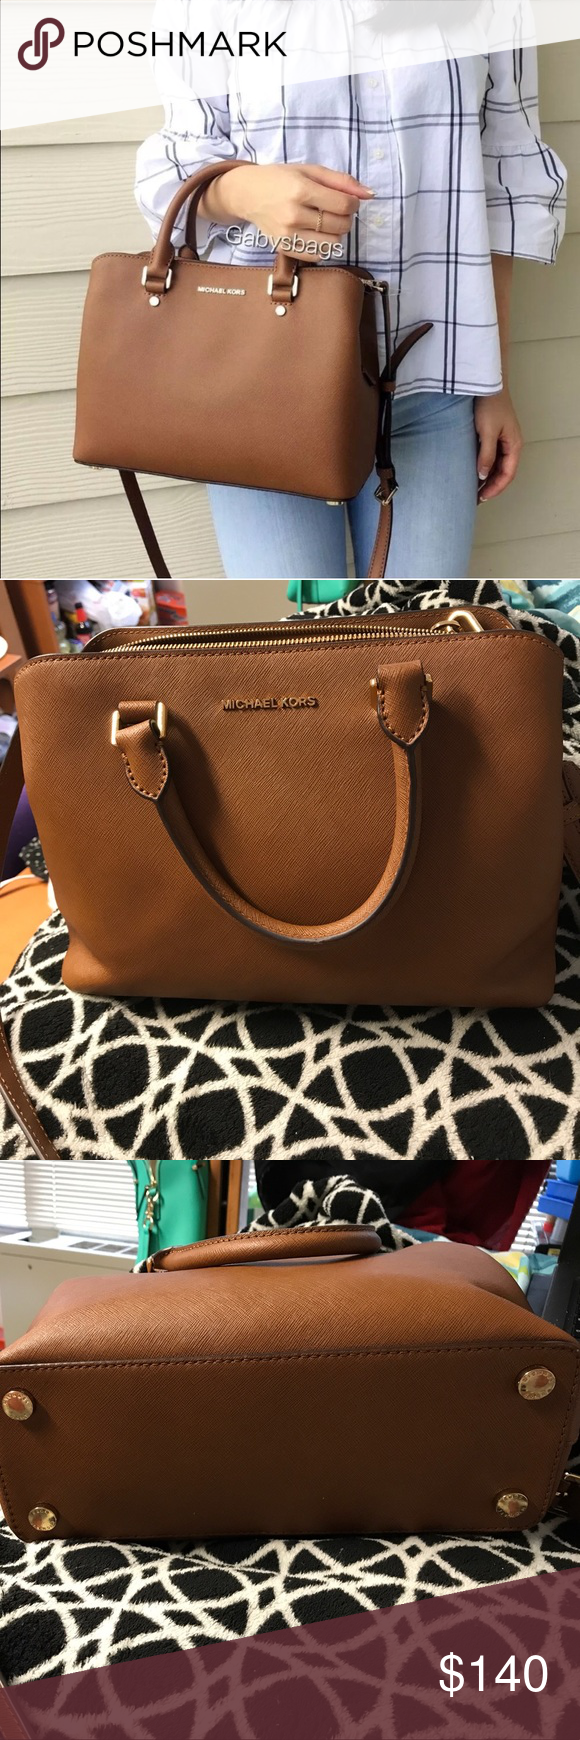 41ccd519b707 MK Savannah handbag Michael kors Savannah medium satchel. Beautiful brown  luggage color for a MK